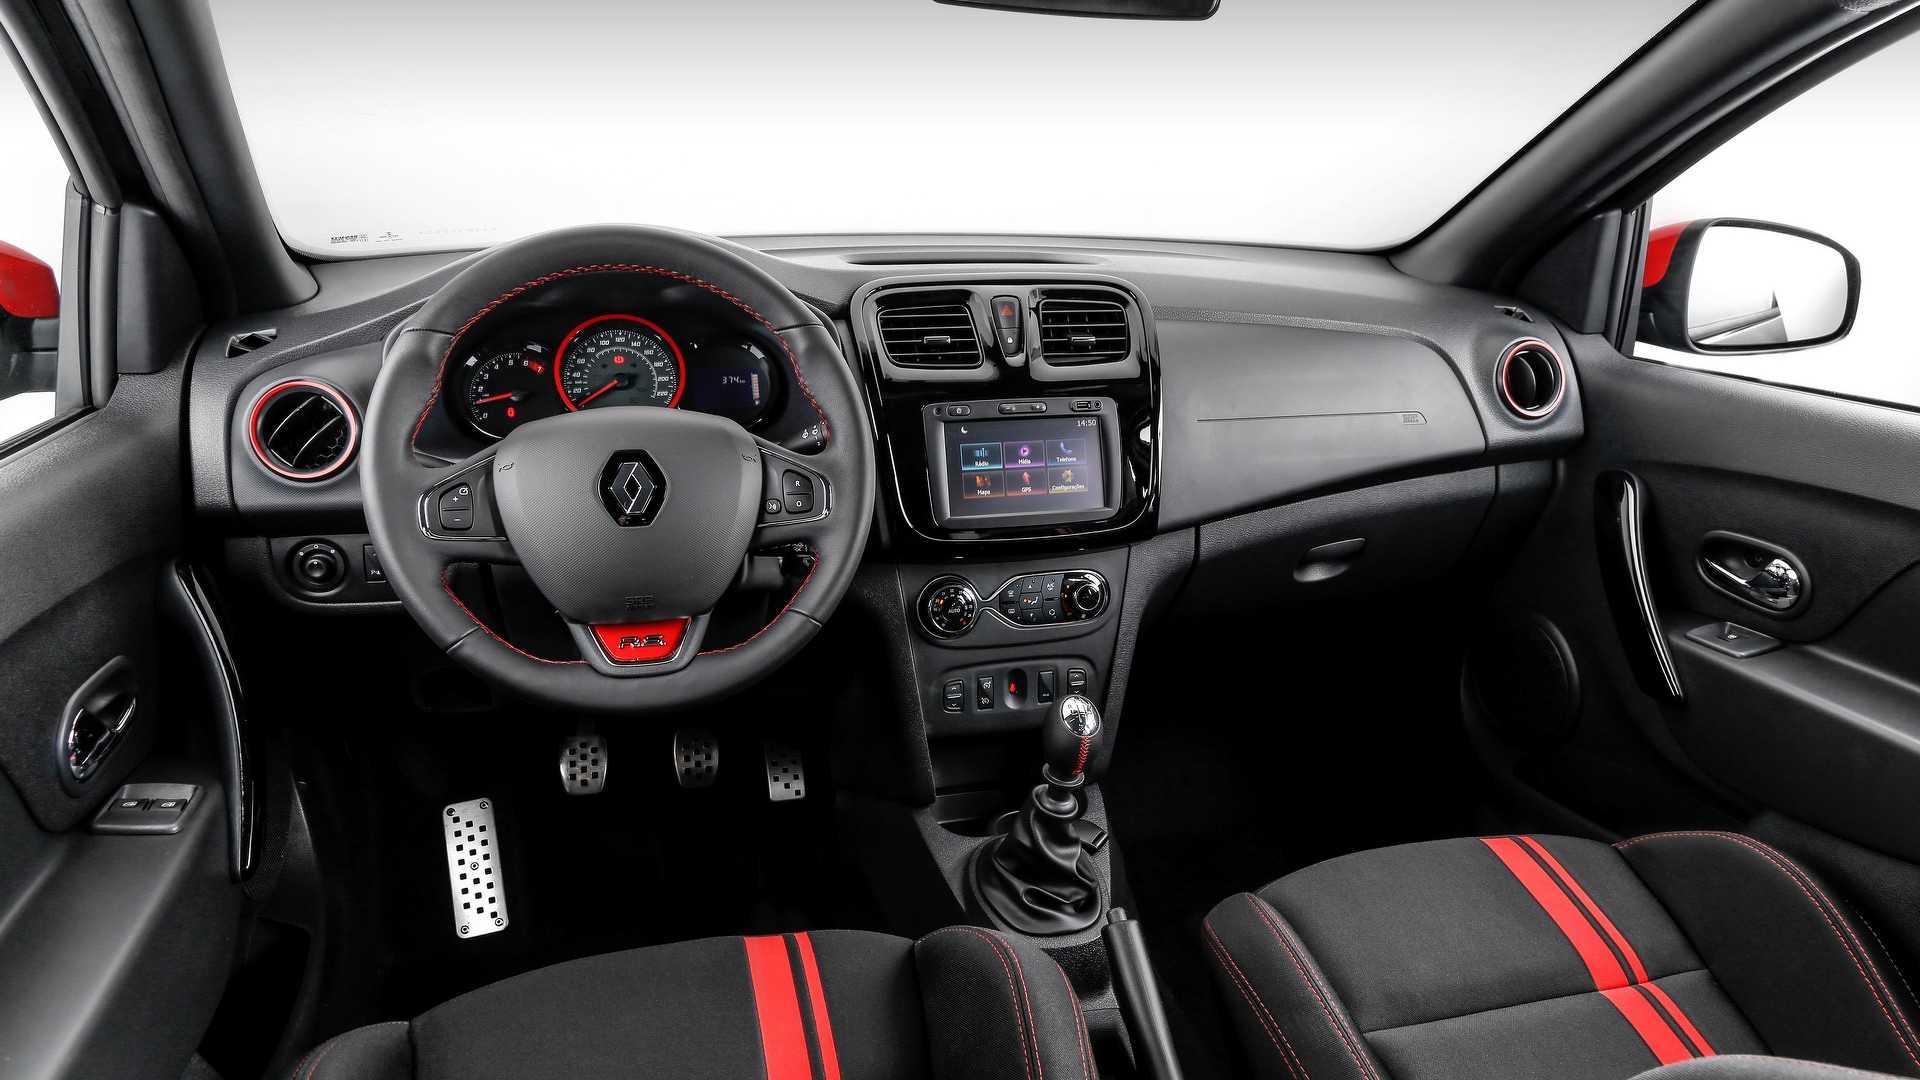 98 New 2019 Renault Sandero Style for 2019 Renault Sandero